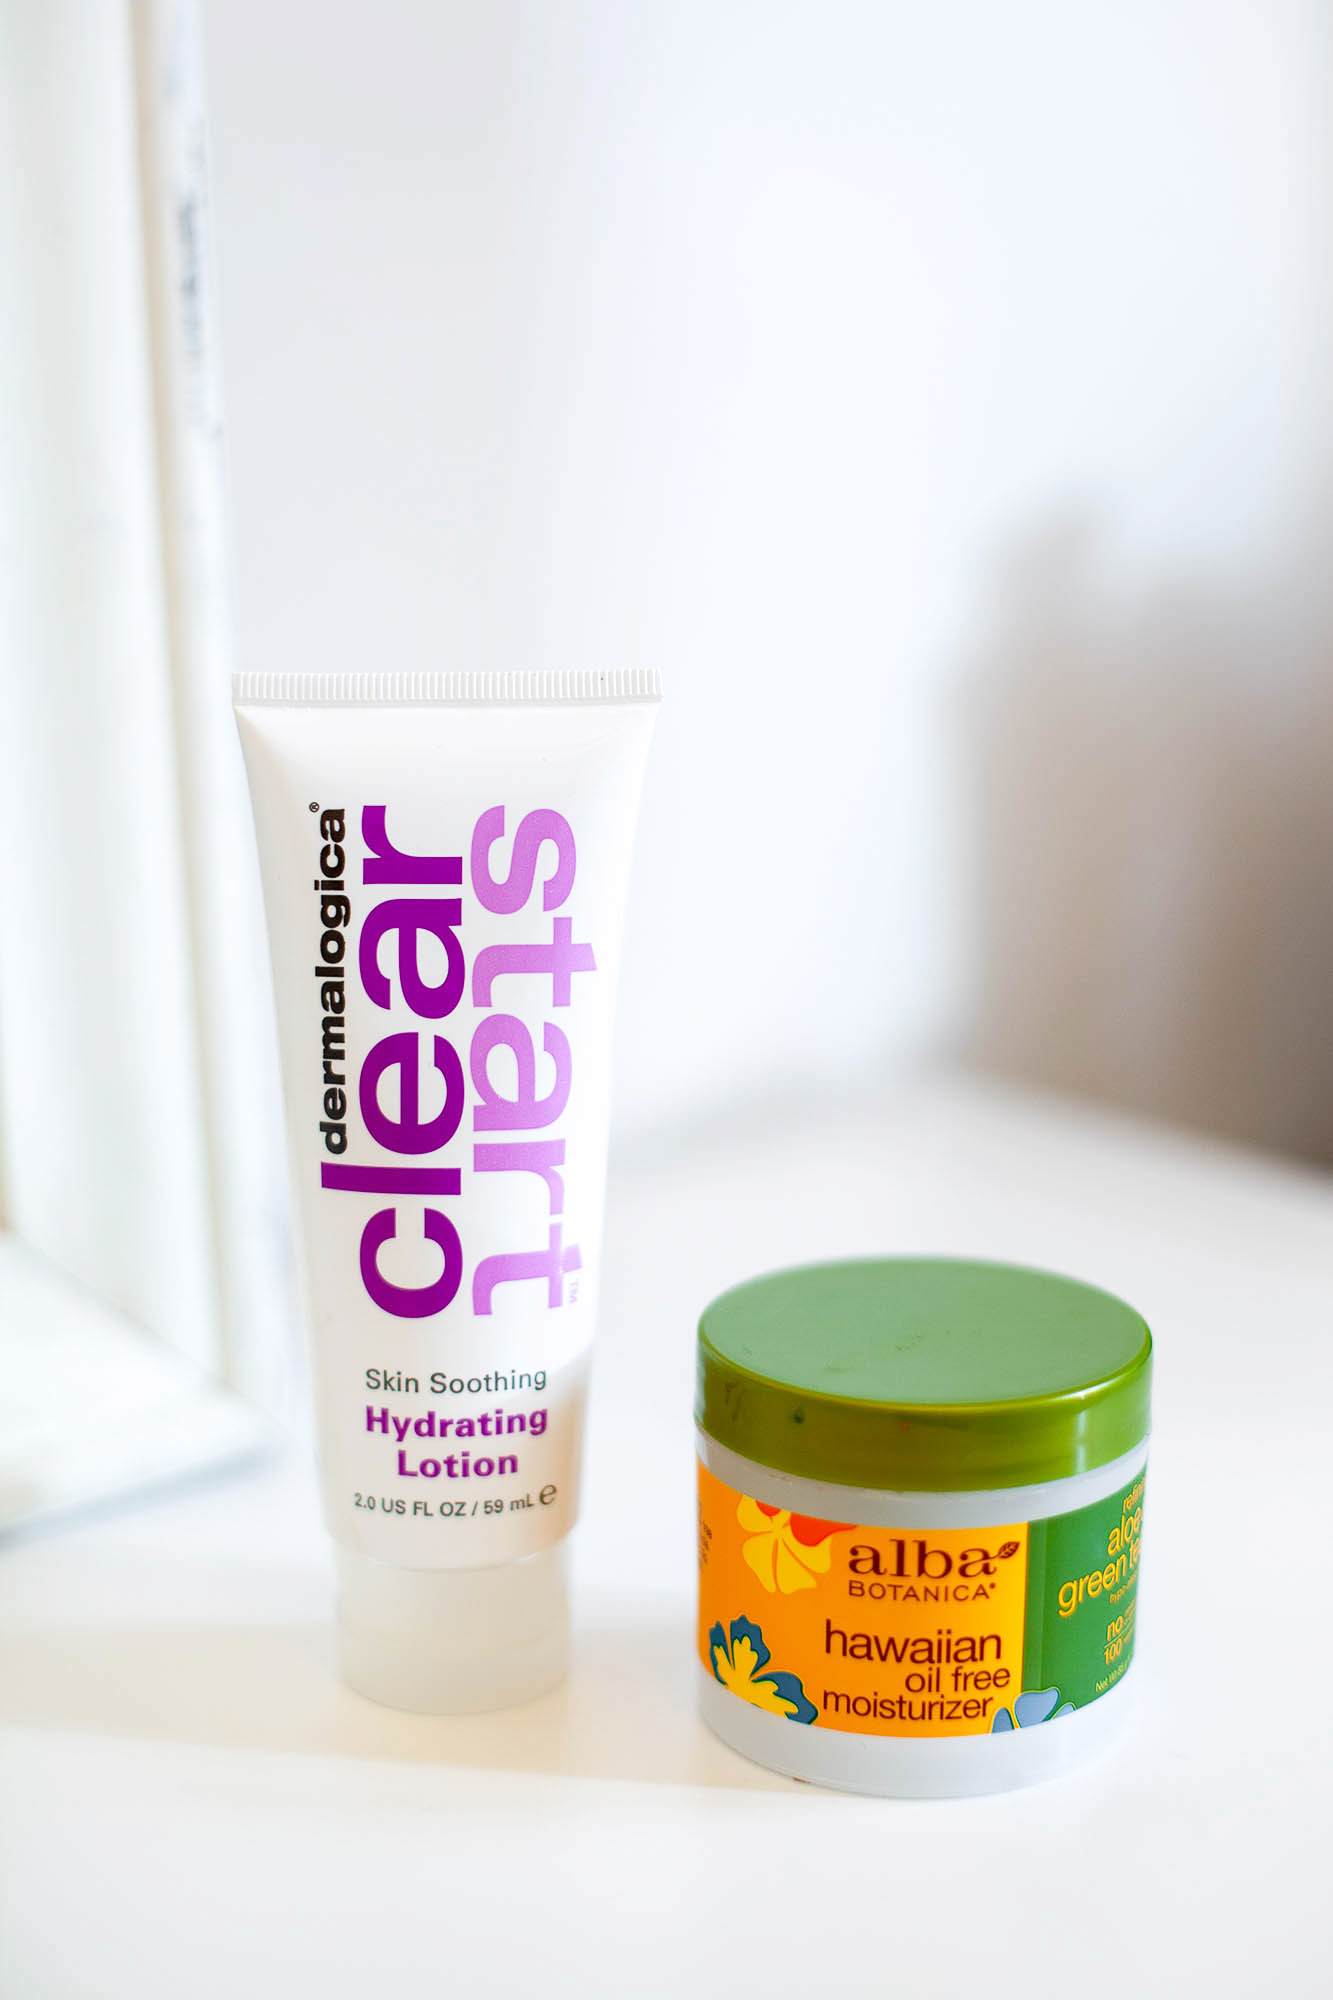 Skincare Products I'm Loving